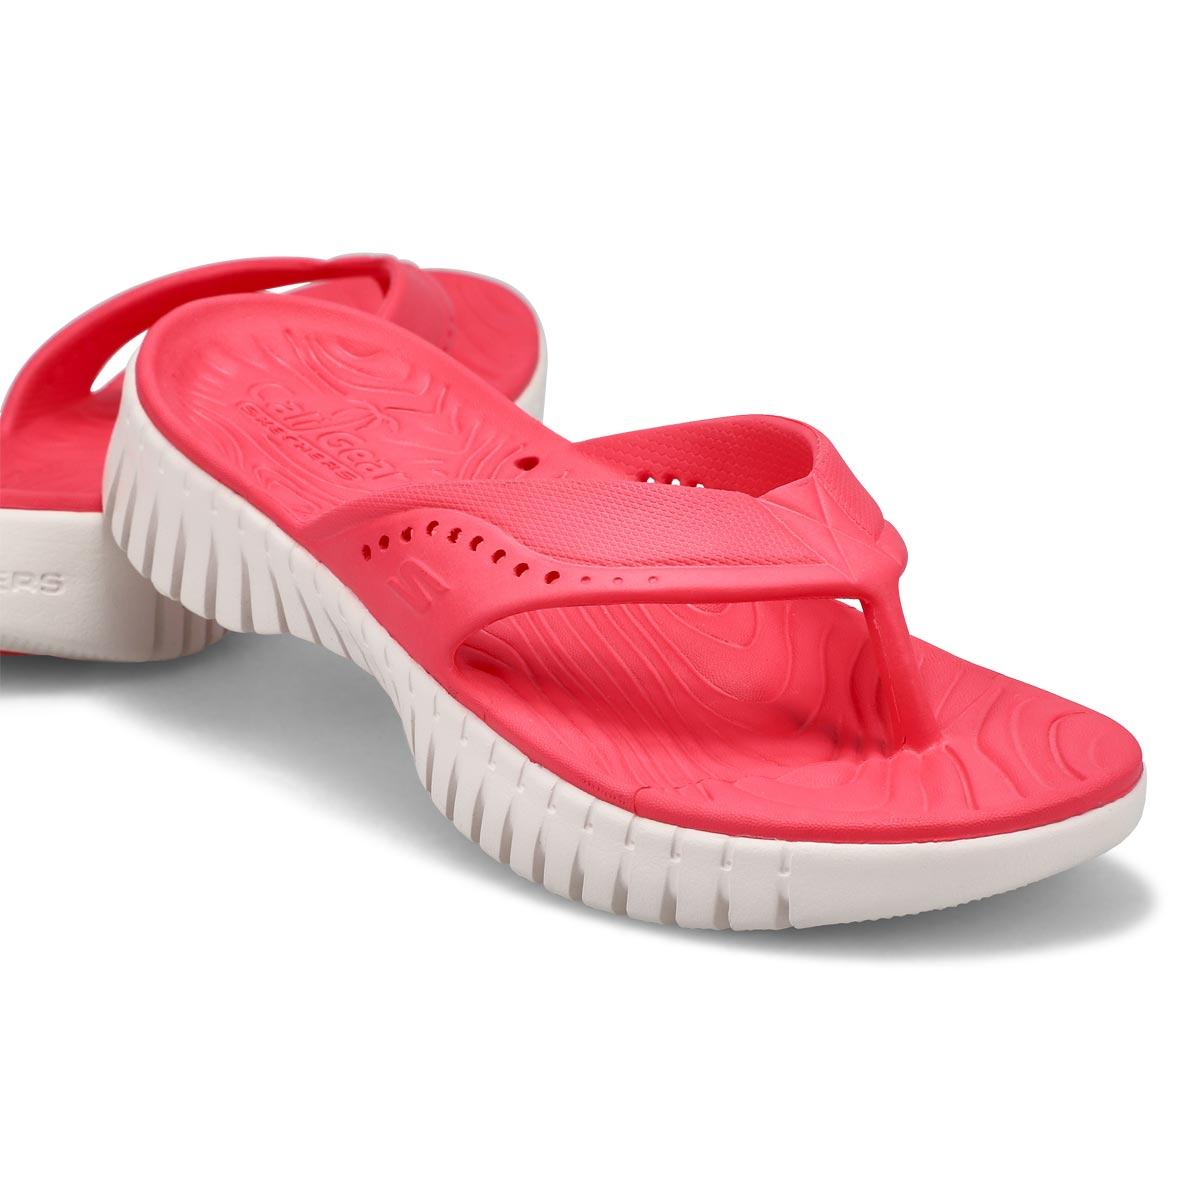 Women's Go Walk Smasrt Sandal - Coral